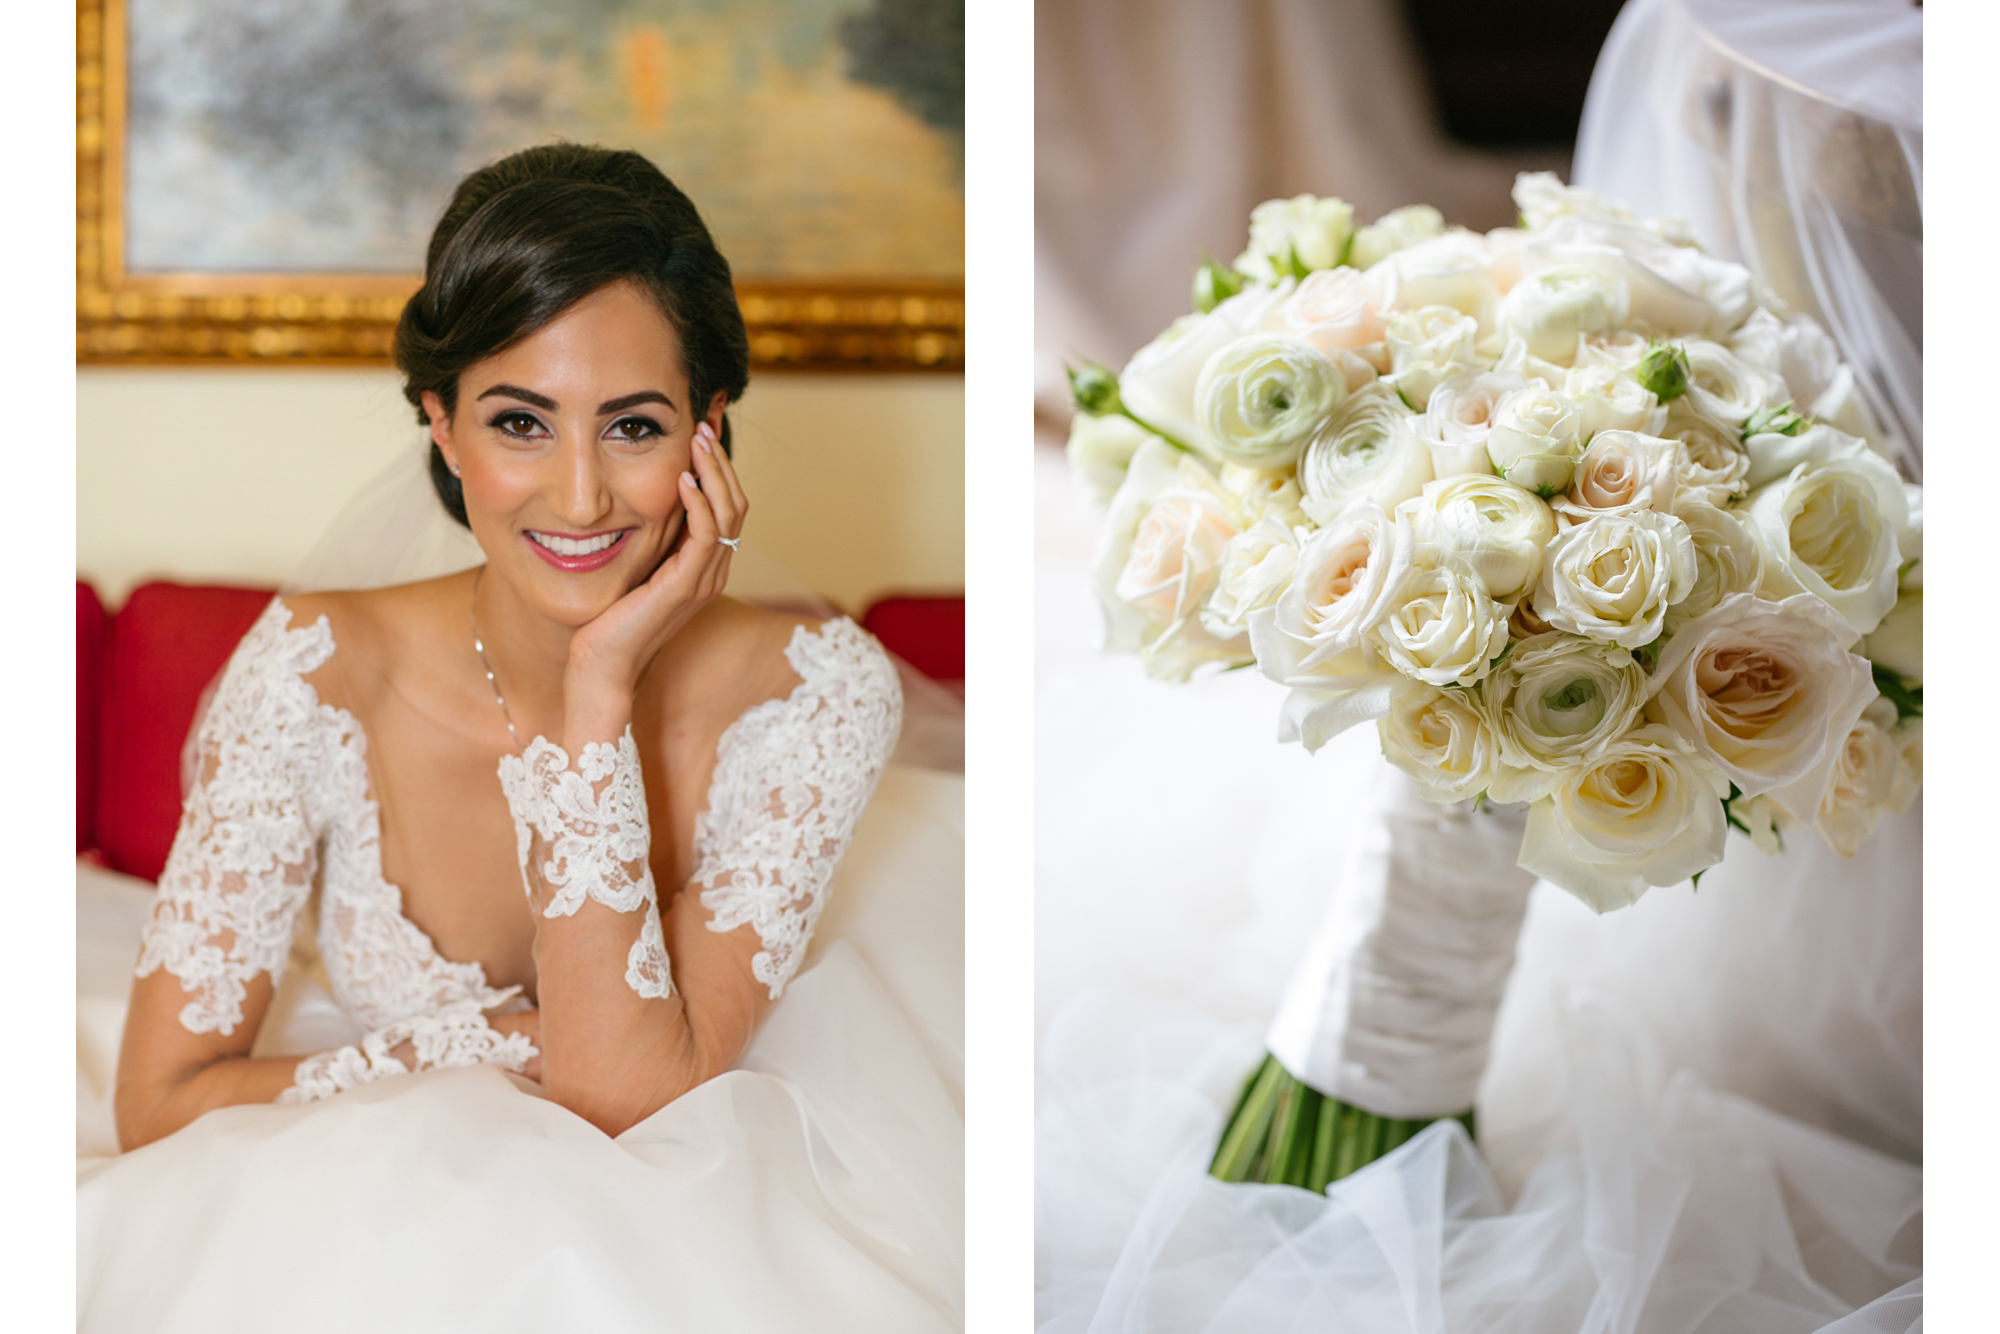 vancouver-luxury-wedding-photographer-lori-miles-16.jpg